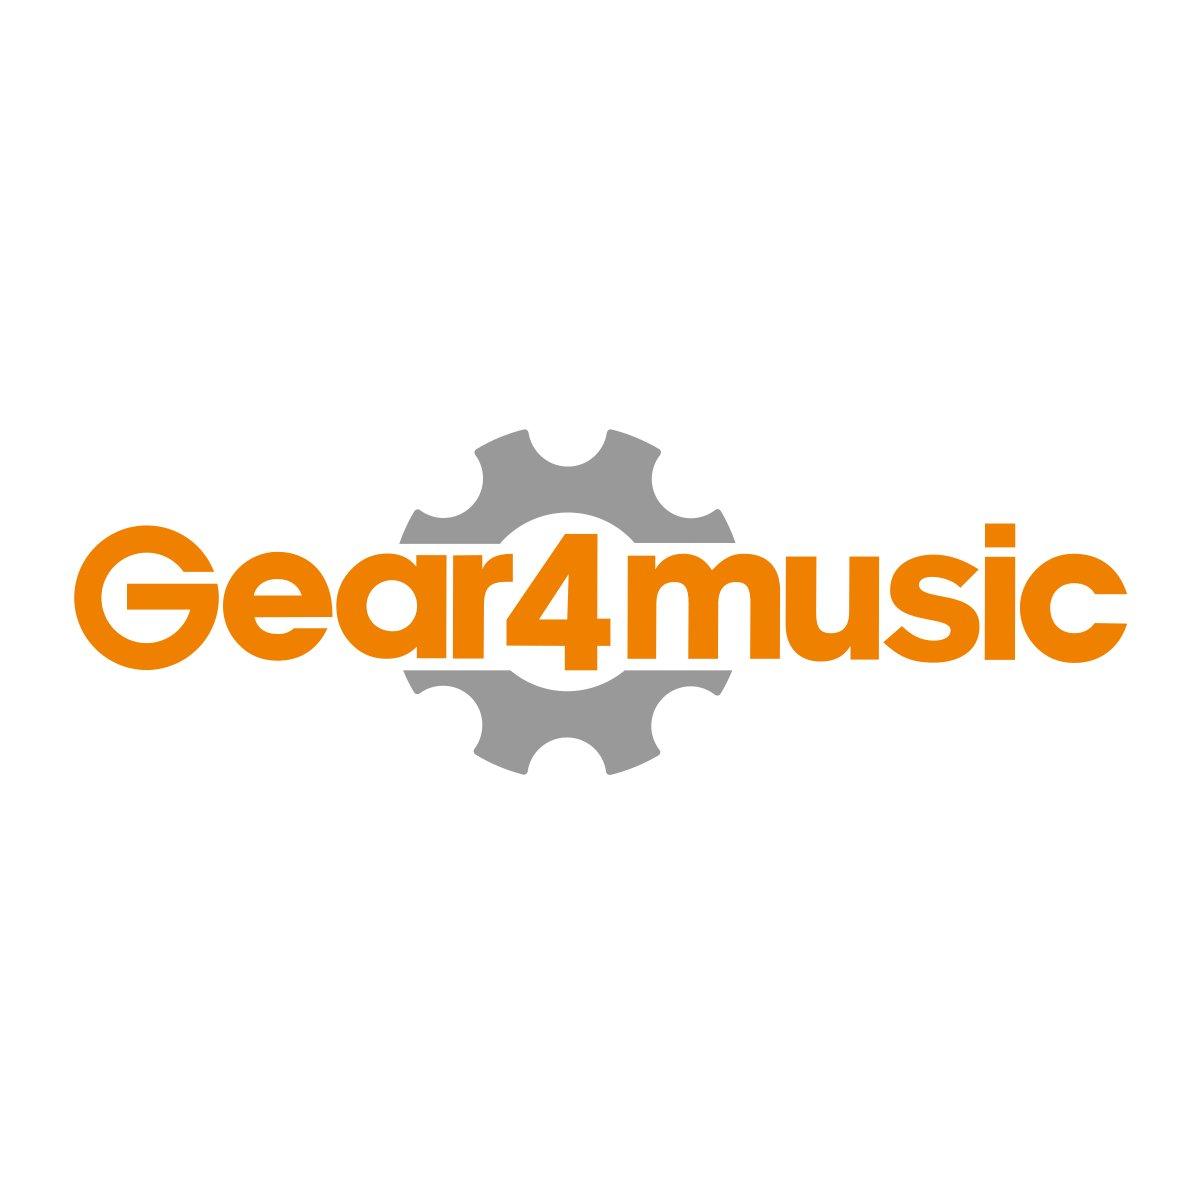 radial hotshot dm1 dynamic mic switcher at gear4music. Black Bedroom Furniture Sets. Home Design Ideas